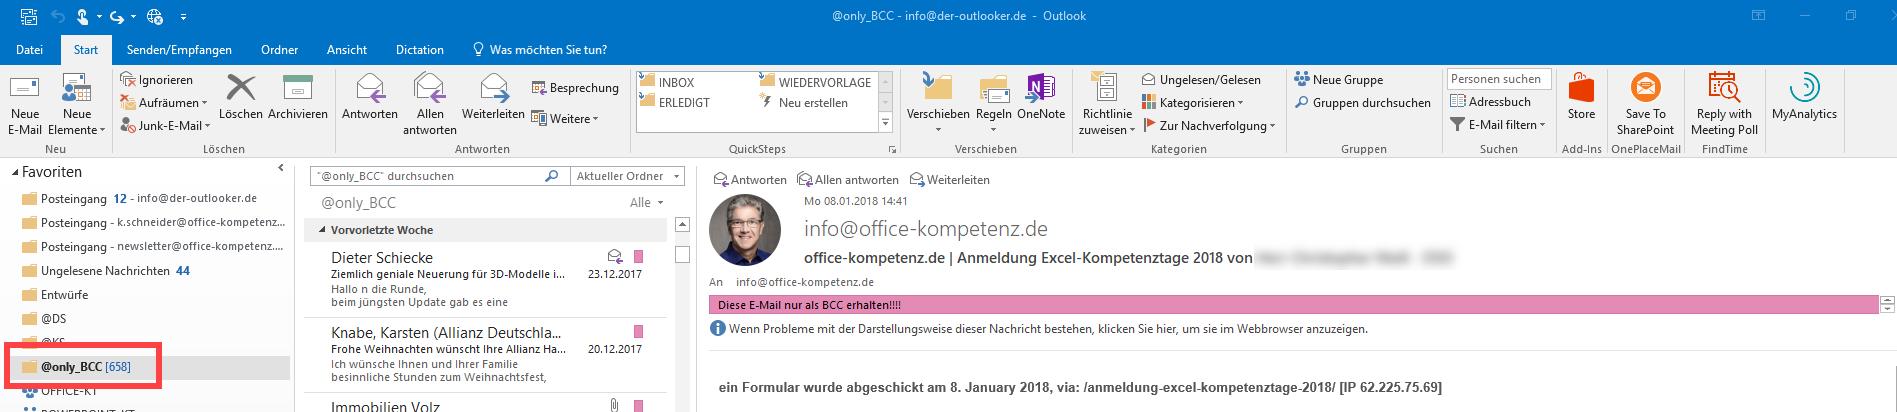 Fazit: Massenhaft E-Mails mit nur Bcc